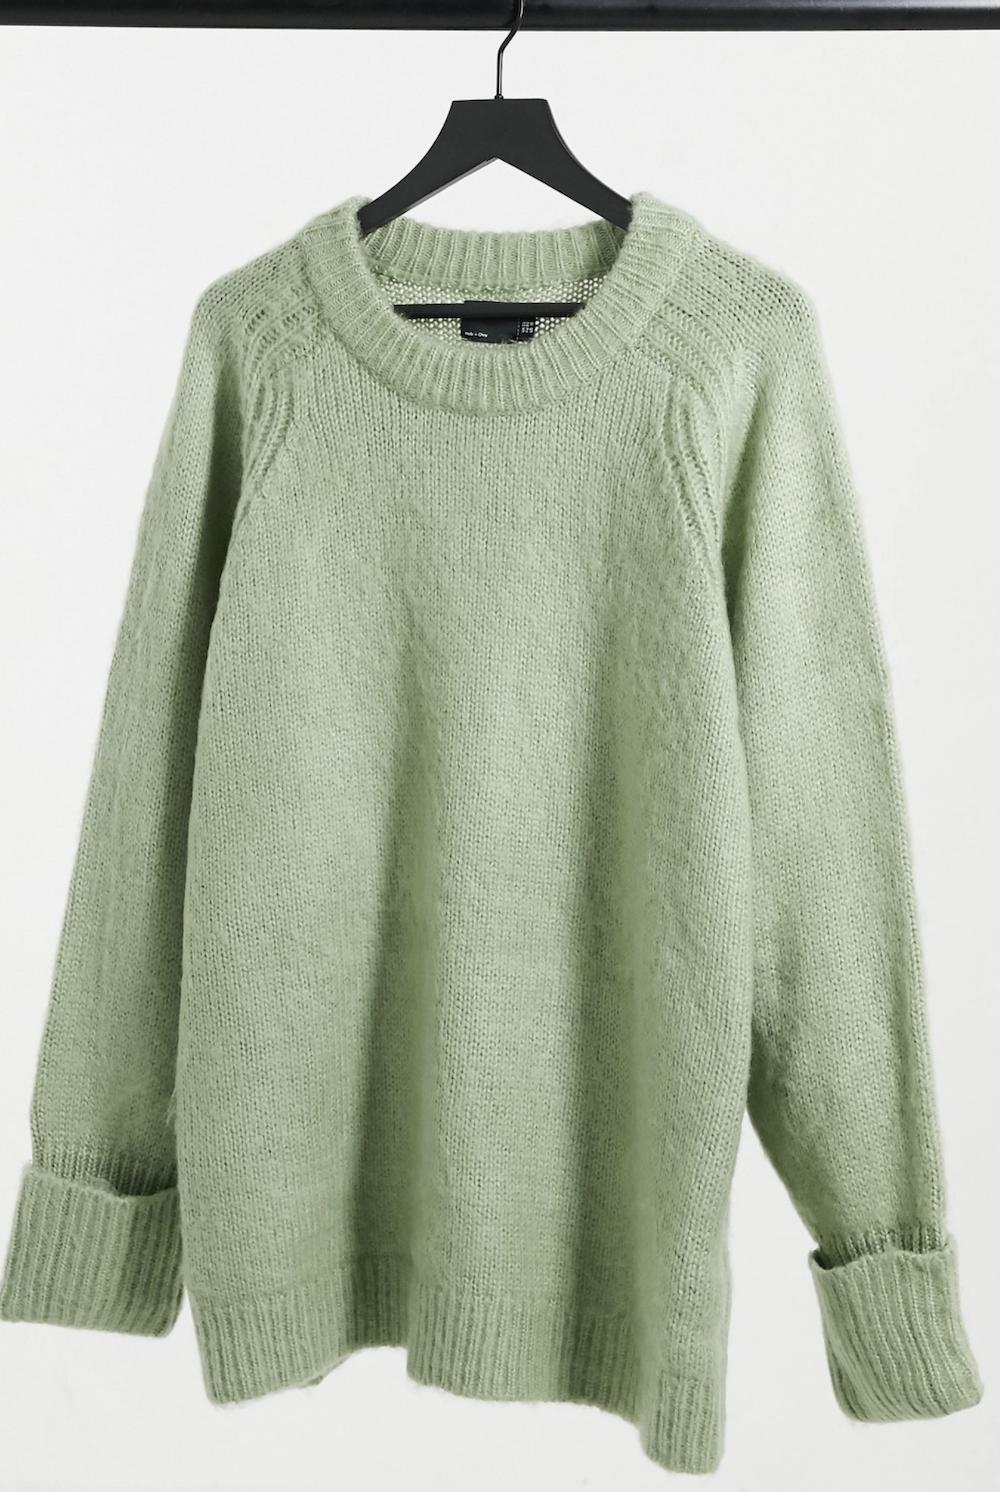 Jersey extragrande verde salvia de hilo cepillado de ASOS DESIGN Curve